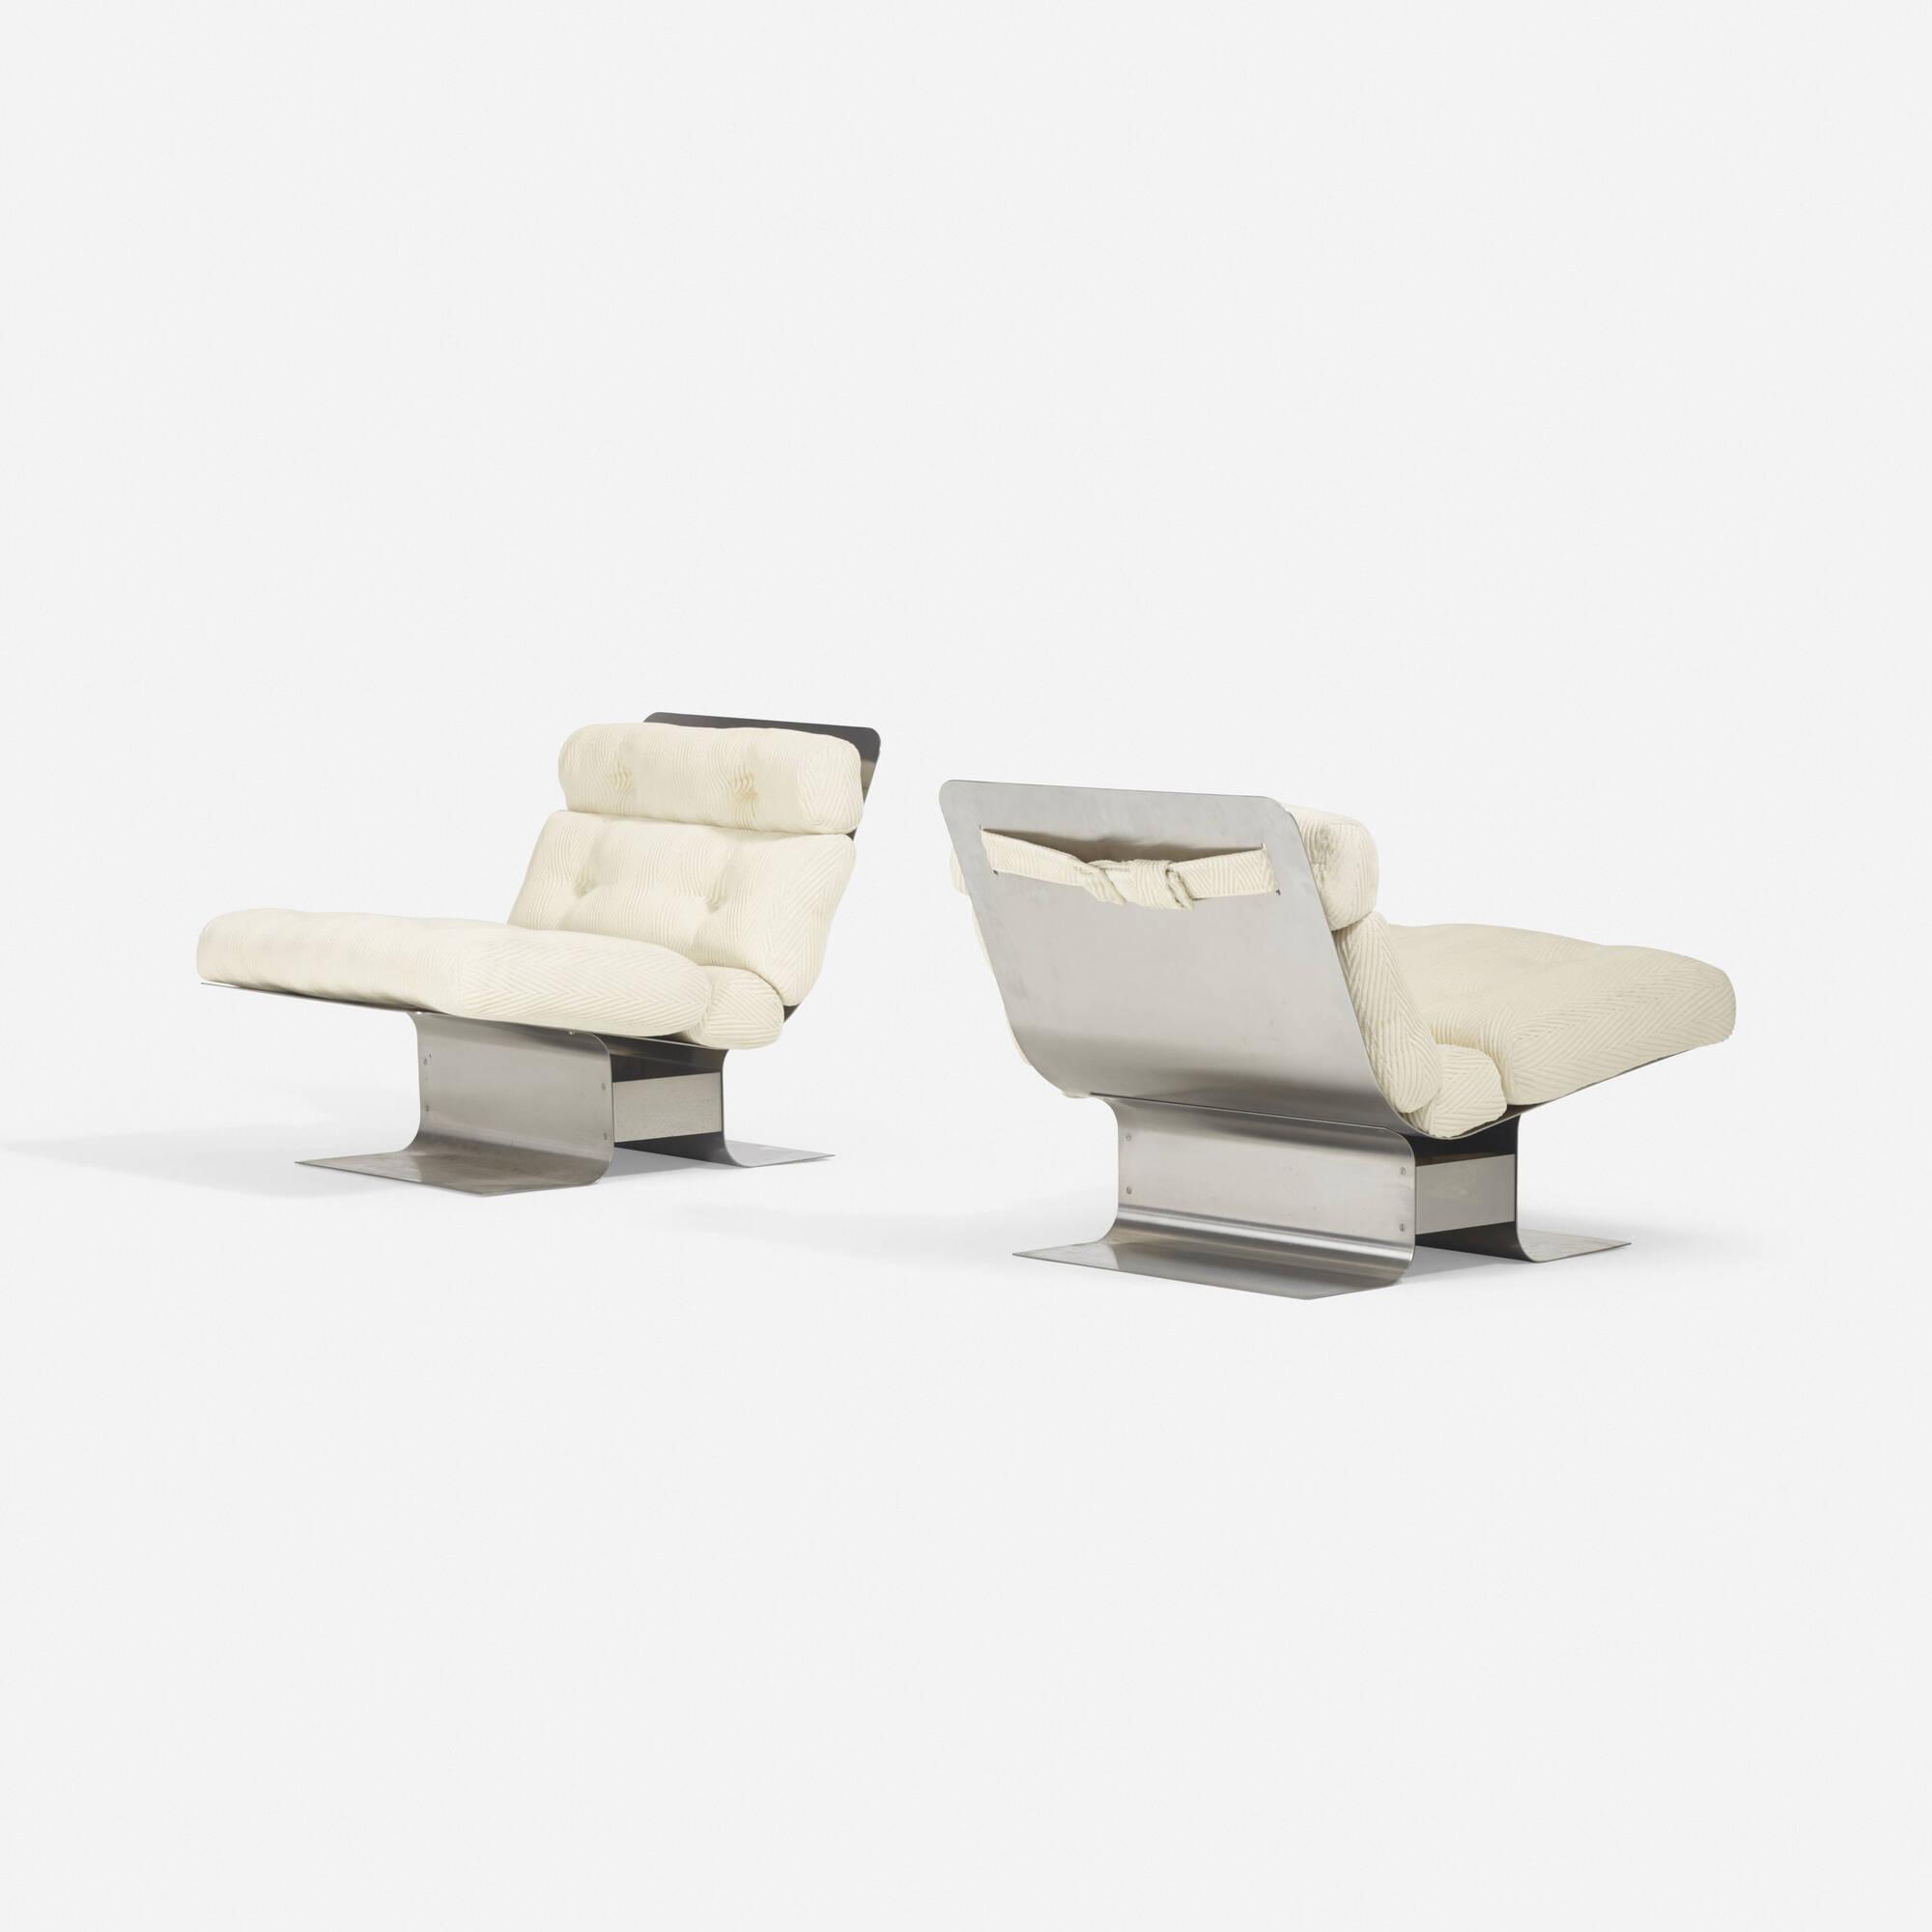 326: François Monnet / lounge chairs, pair (3 of 3)